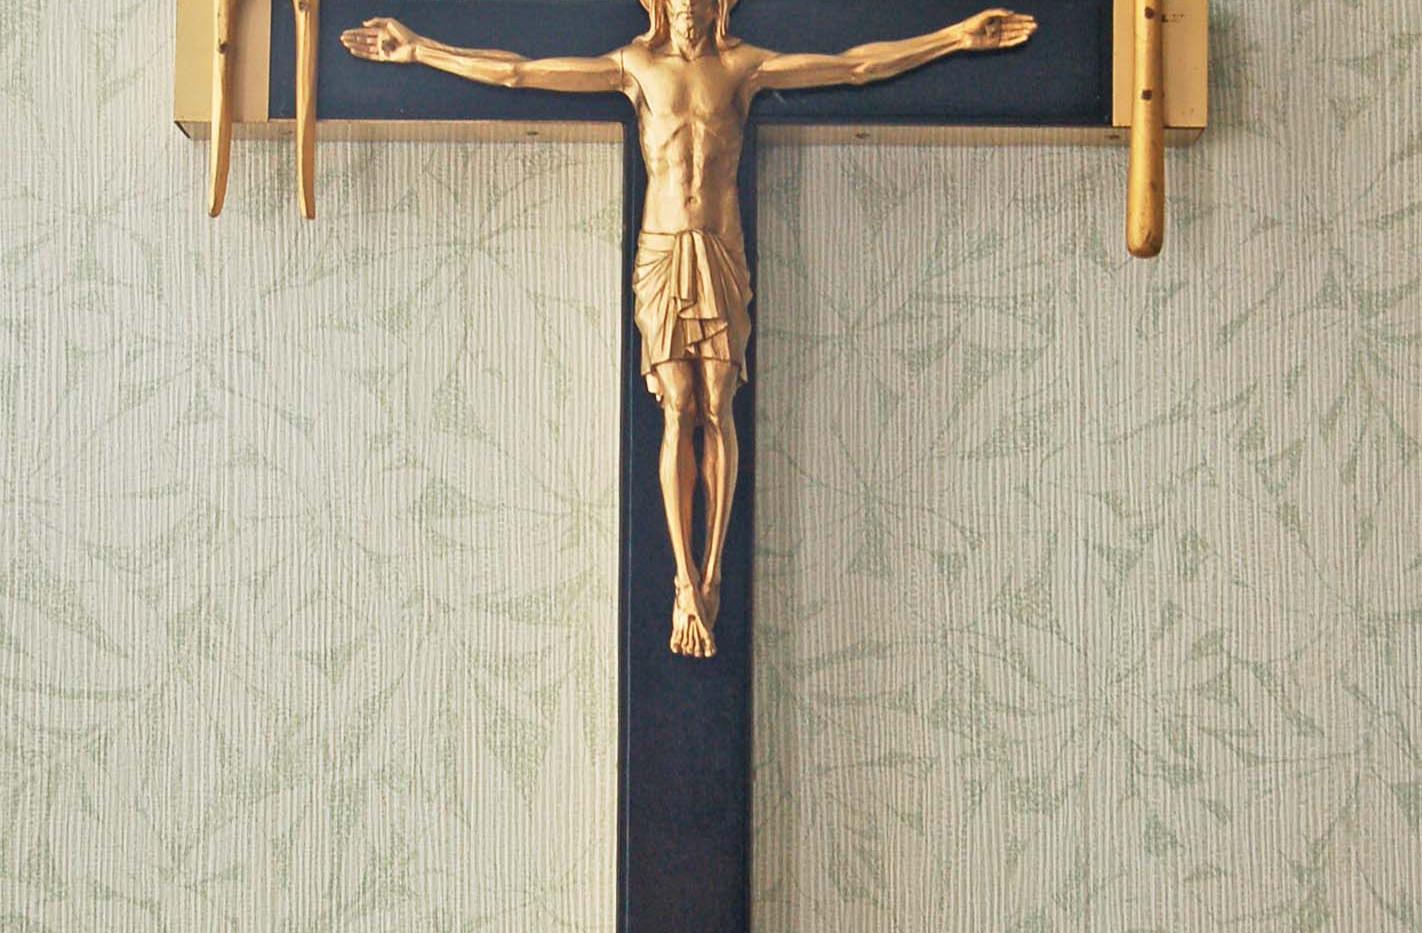 La Salette Pectoral Cross